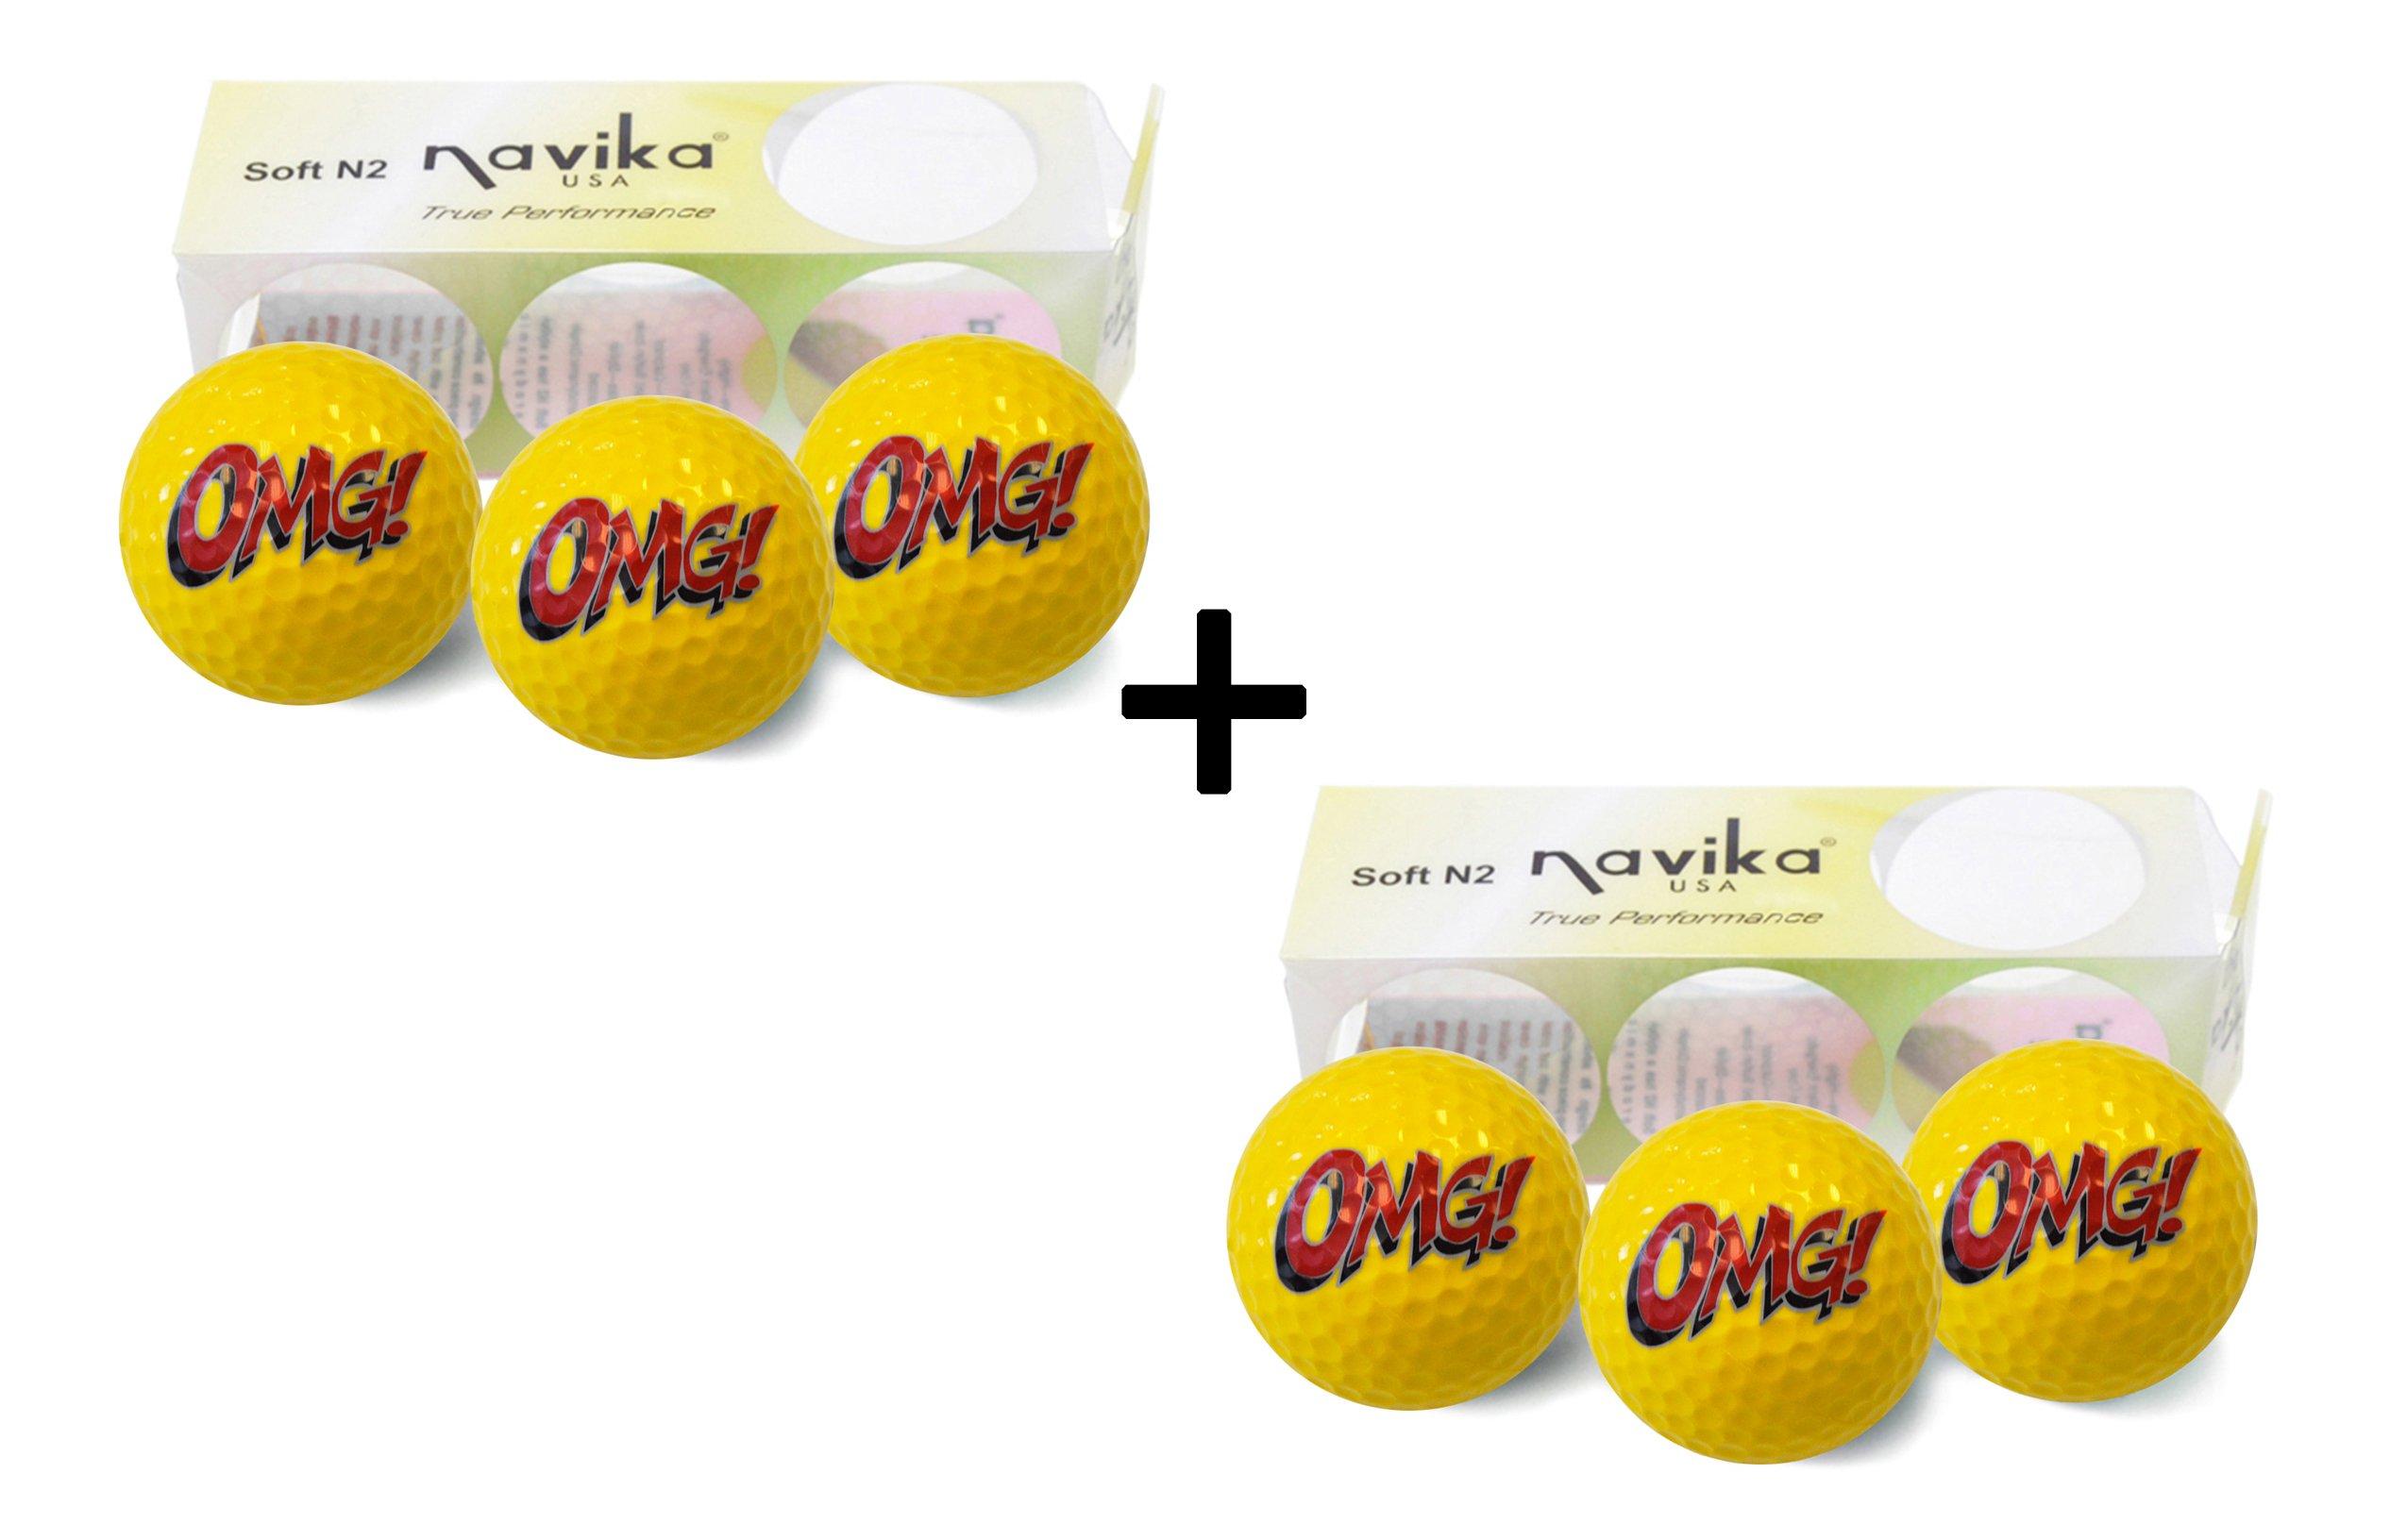 Navika OMG! Golf Balls Emoji Imprint (2 Pack) -Yellow